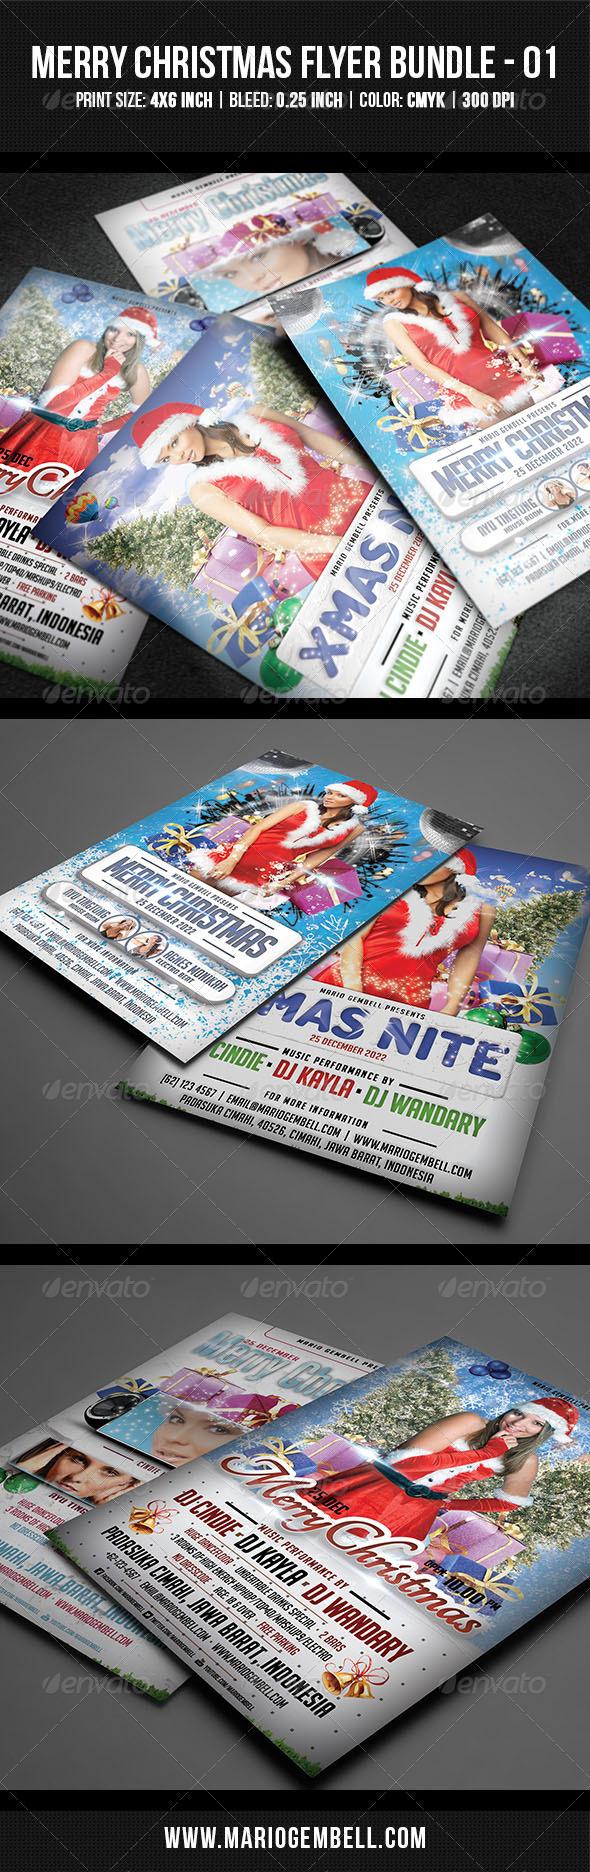 GraphicRiver Merry Christmas Flyer Bundle 01 3539833